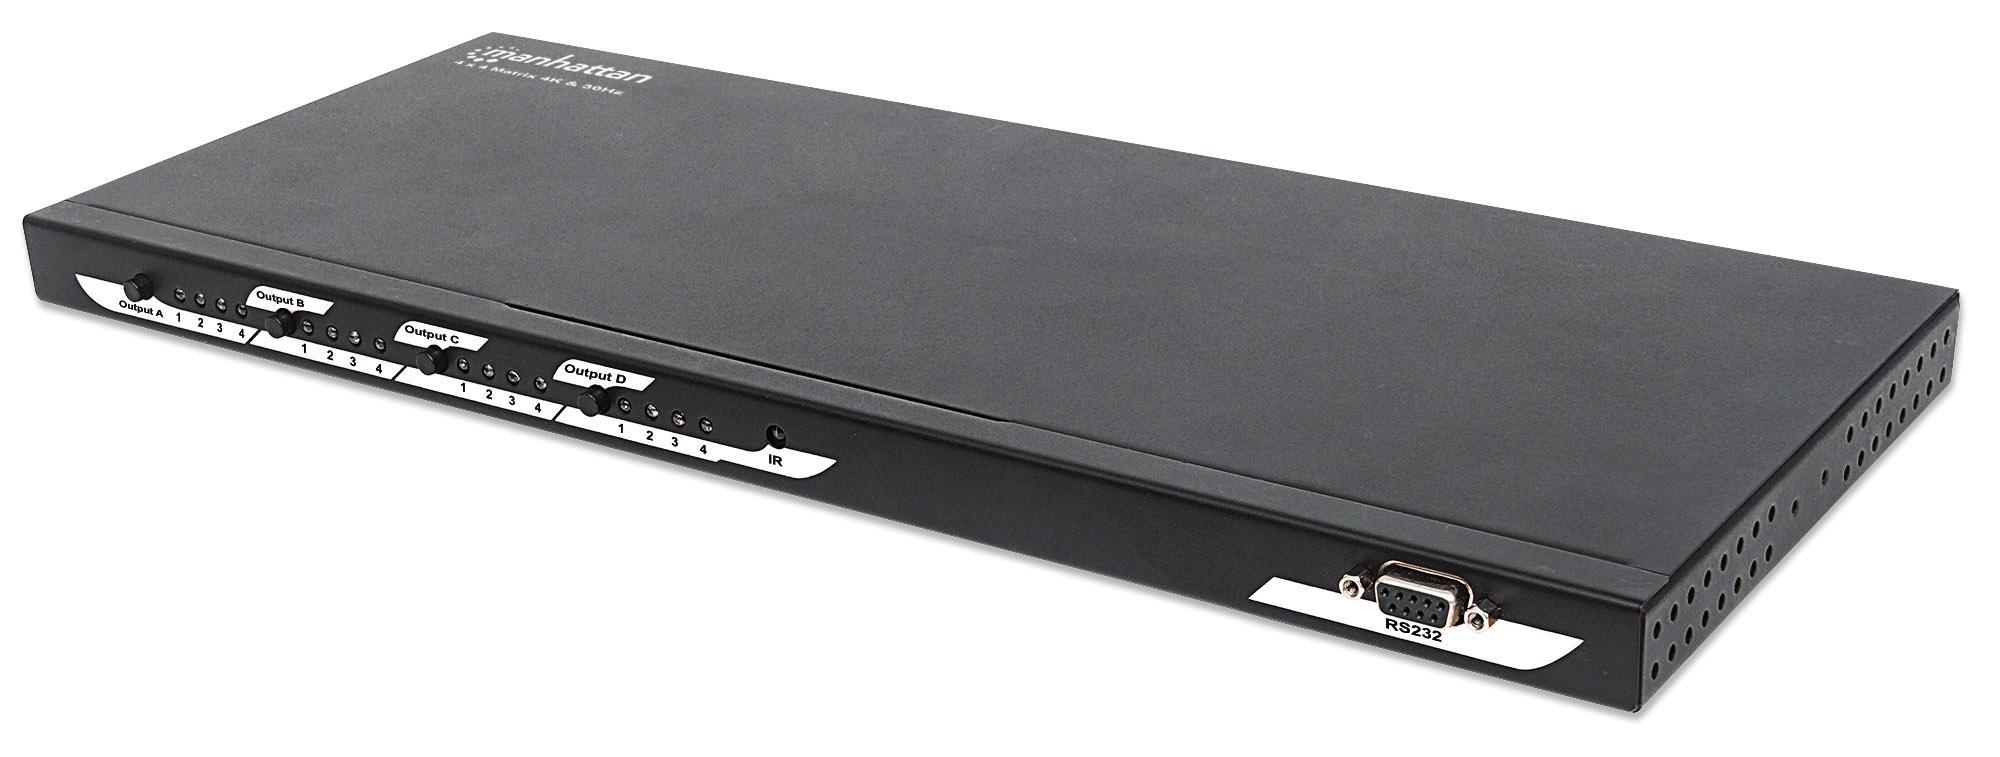 Matrix HDMI 4K 4x4